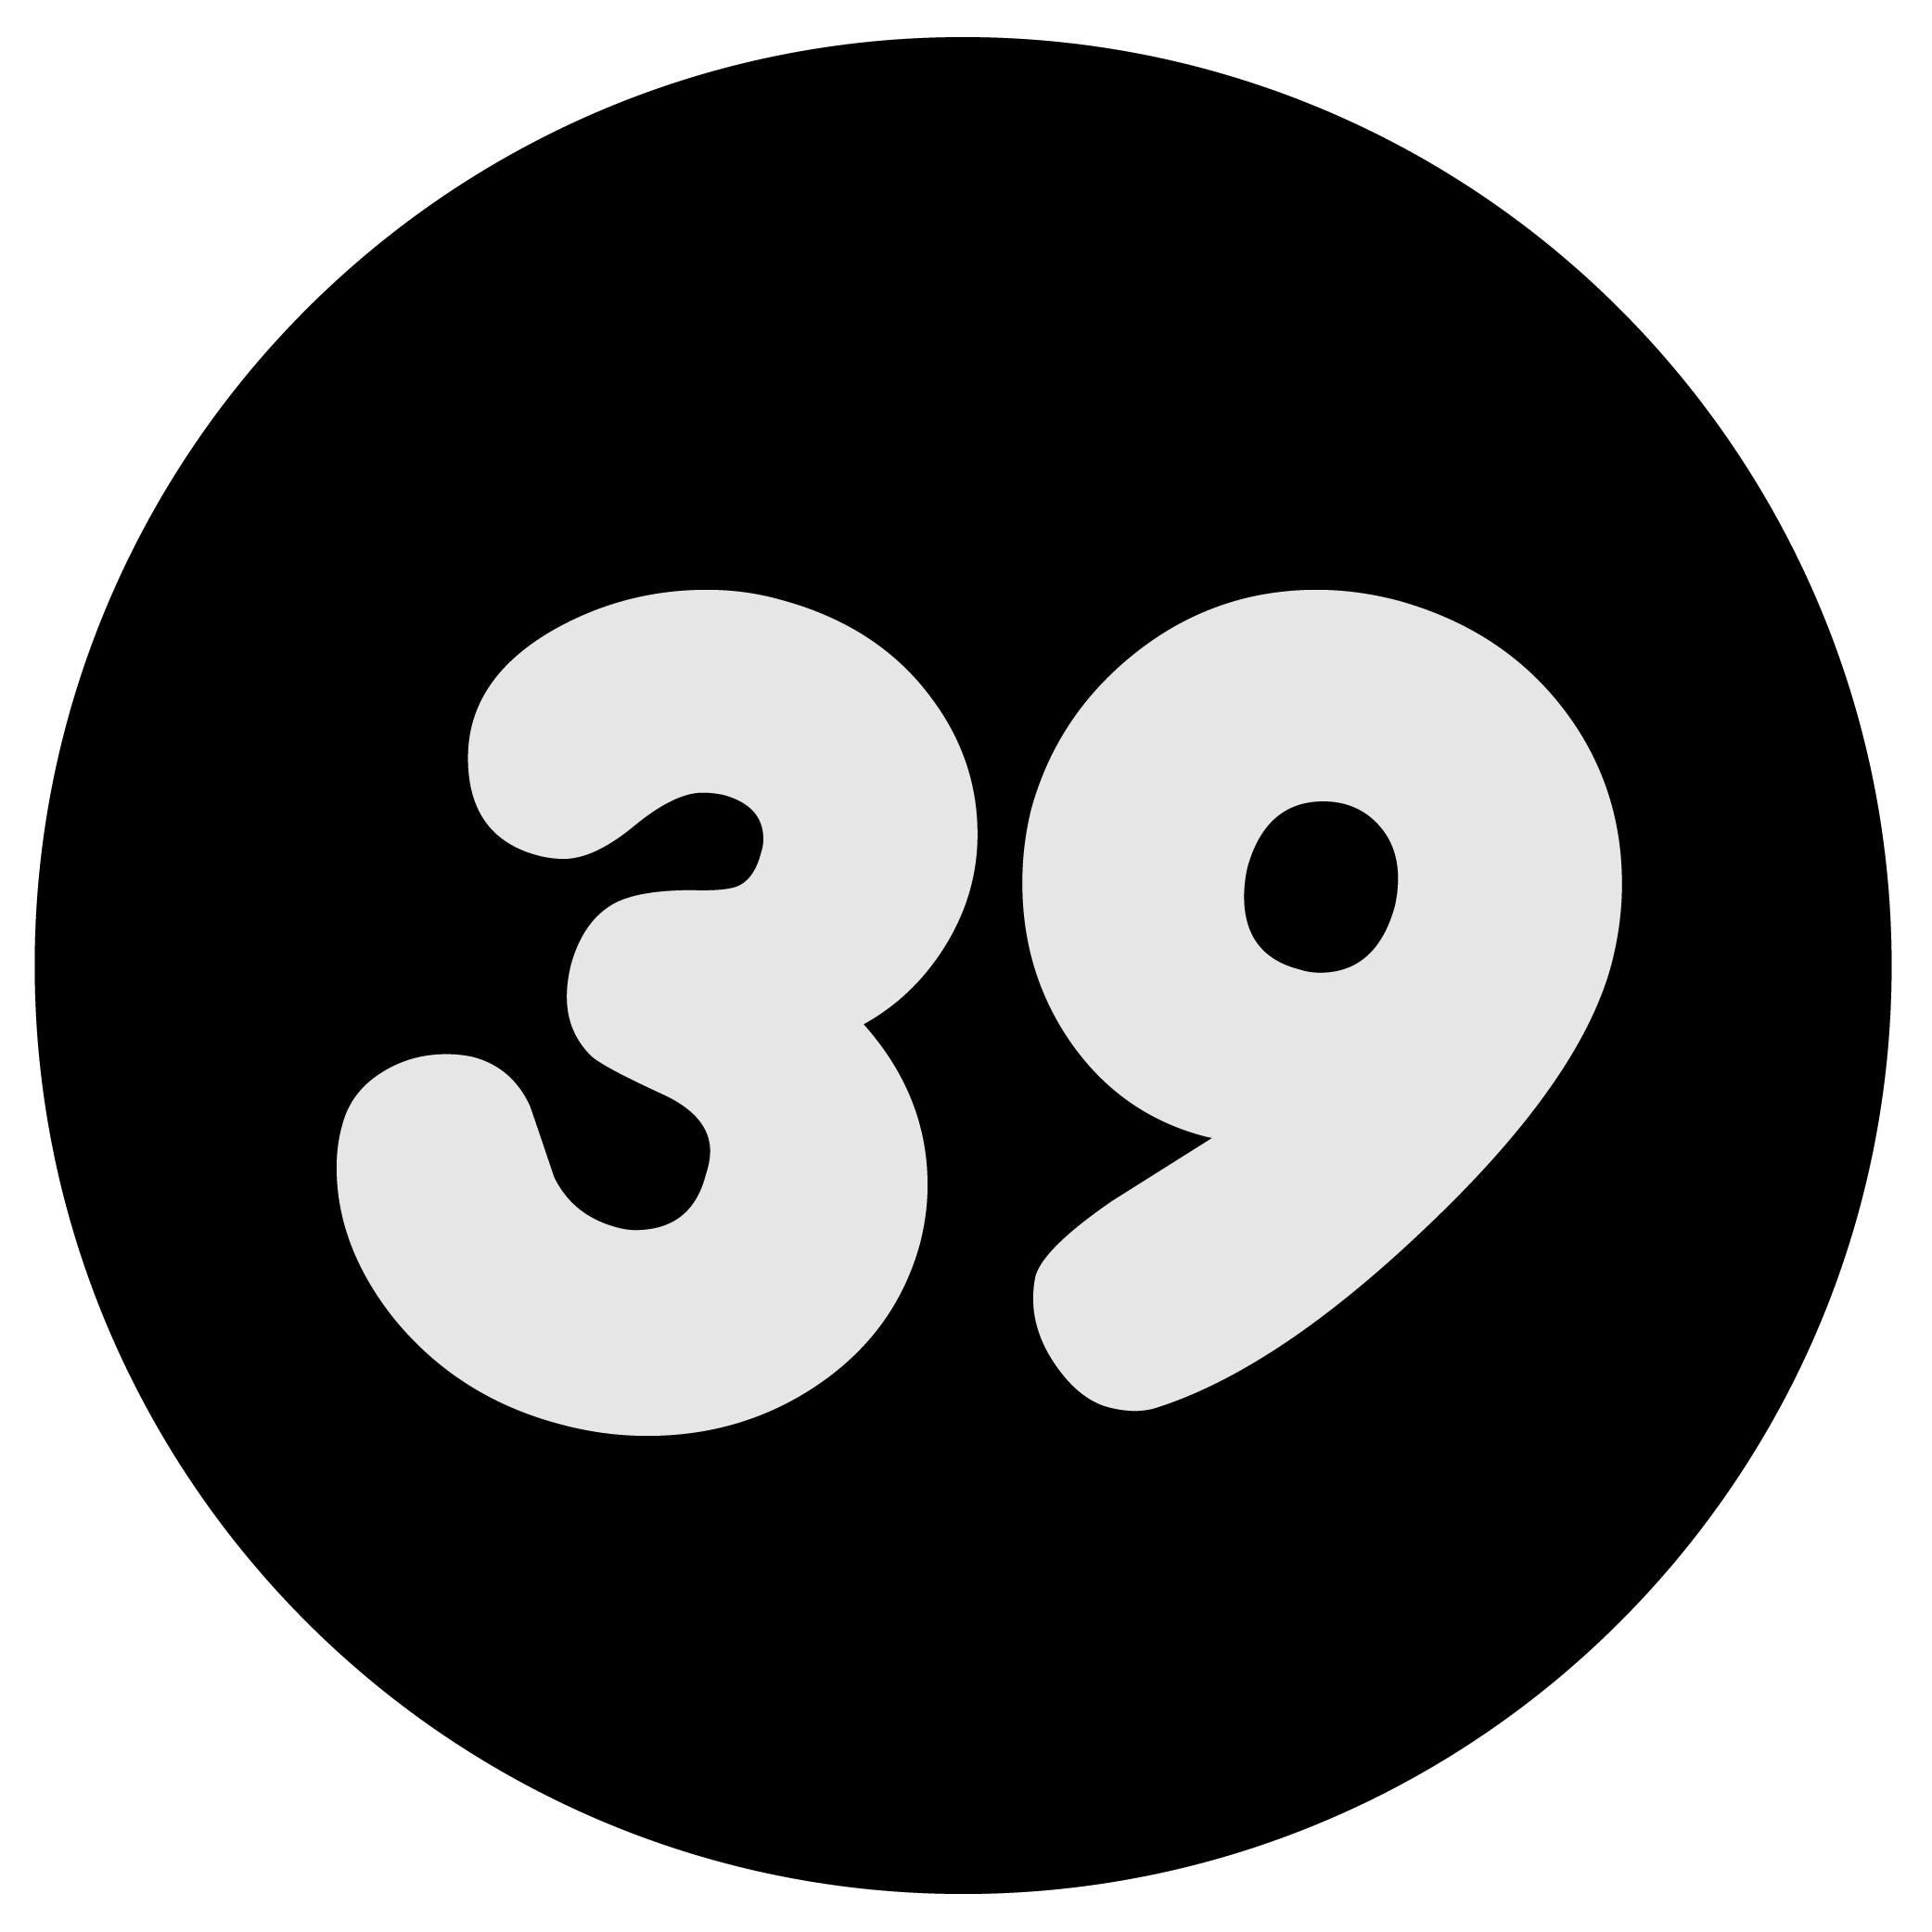 circles1png-28.png